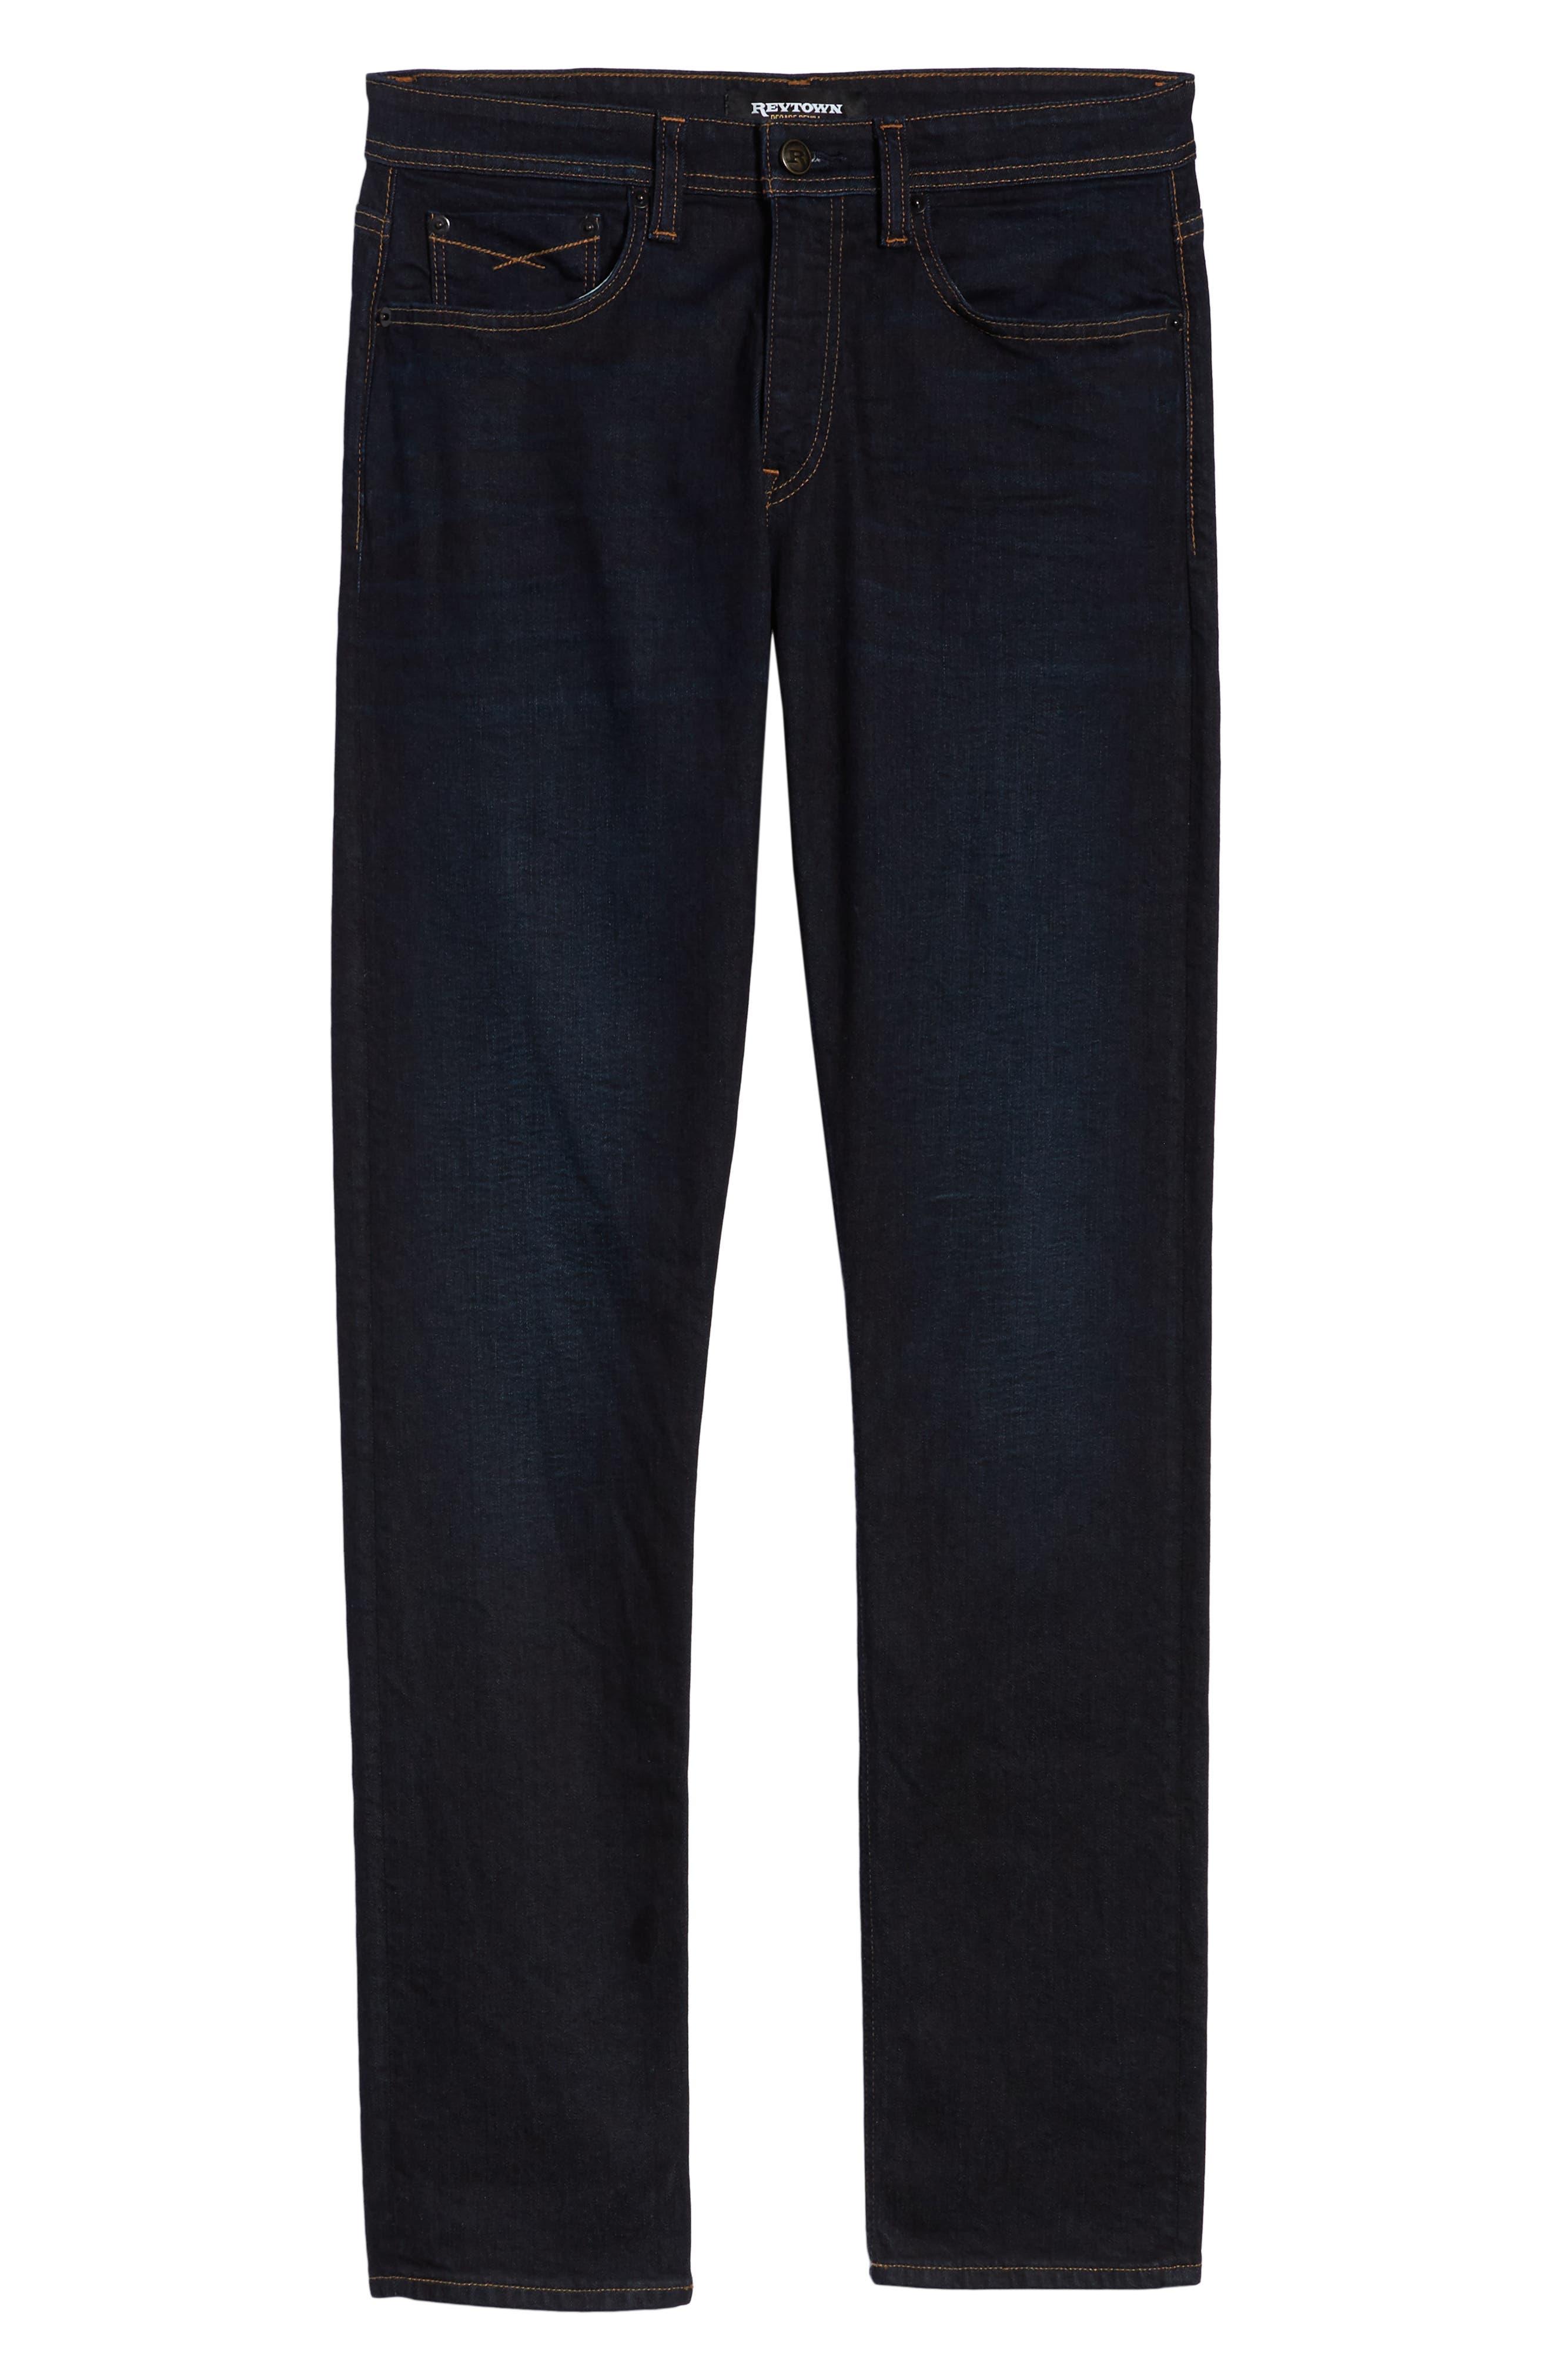 REVTOWN, Sharp Slim Fit Jeans, Alternate thumbnail 6, color, DARK INDIGO